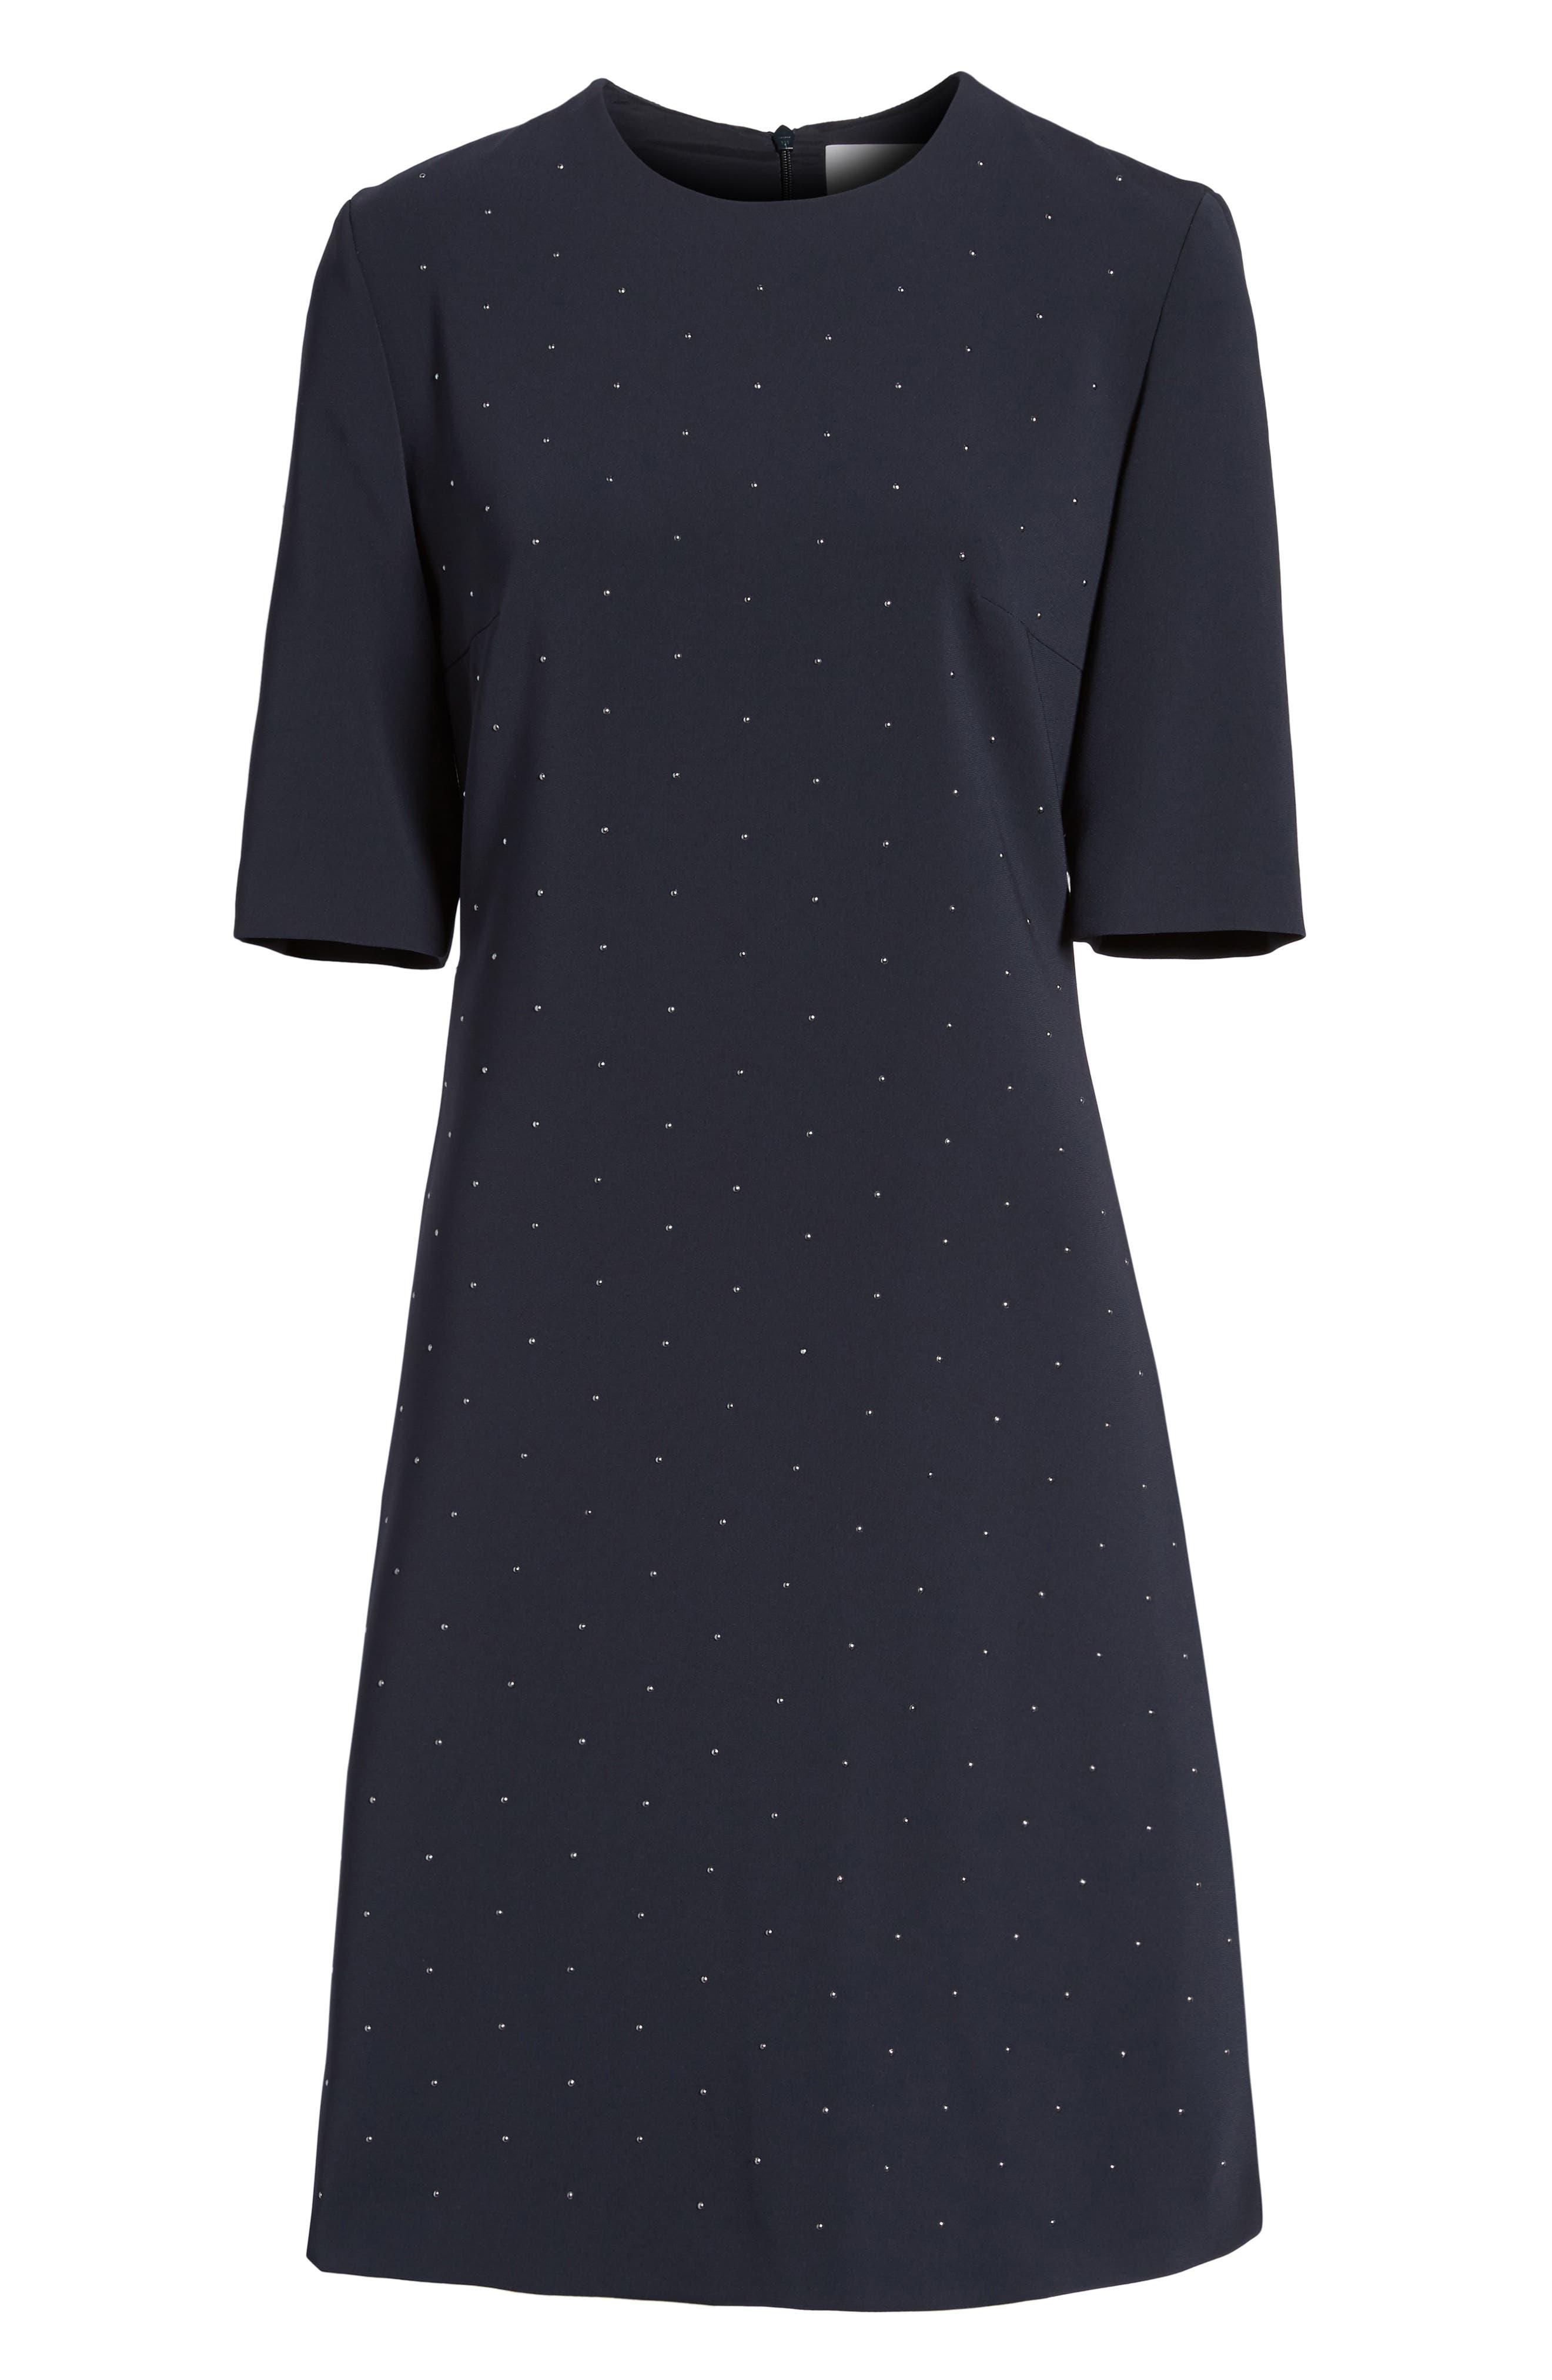 Durasia Embellished A-Line Dress,                             Alternate thumbnail 6, color,                             480